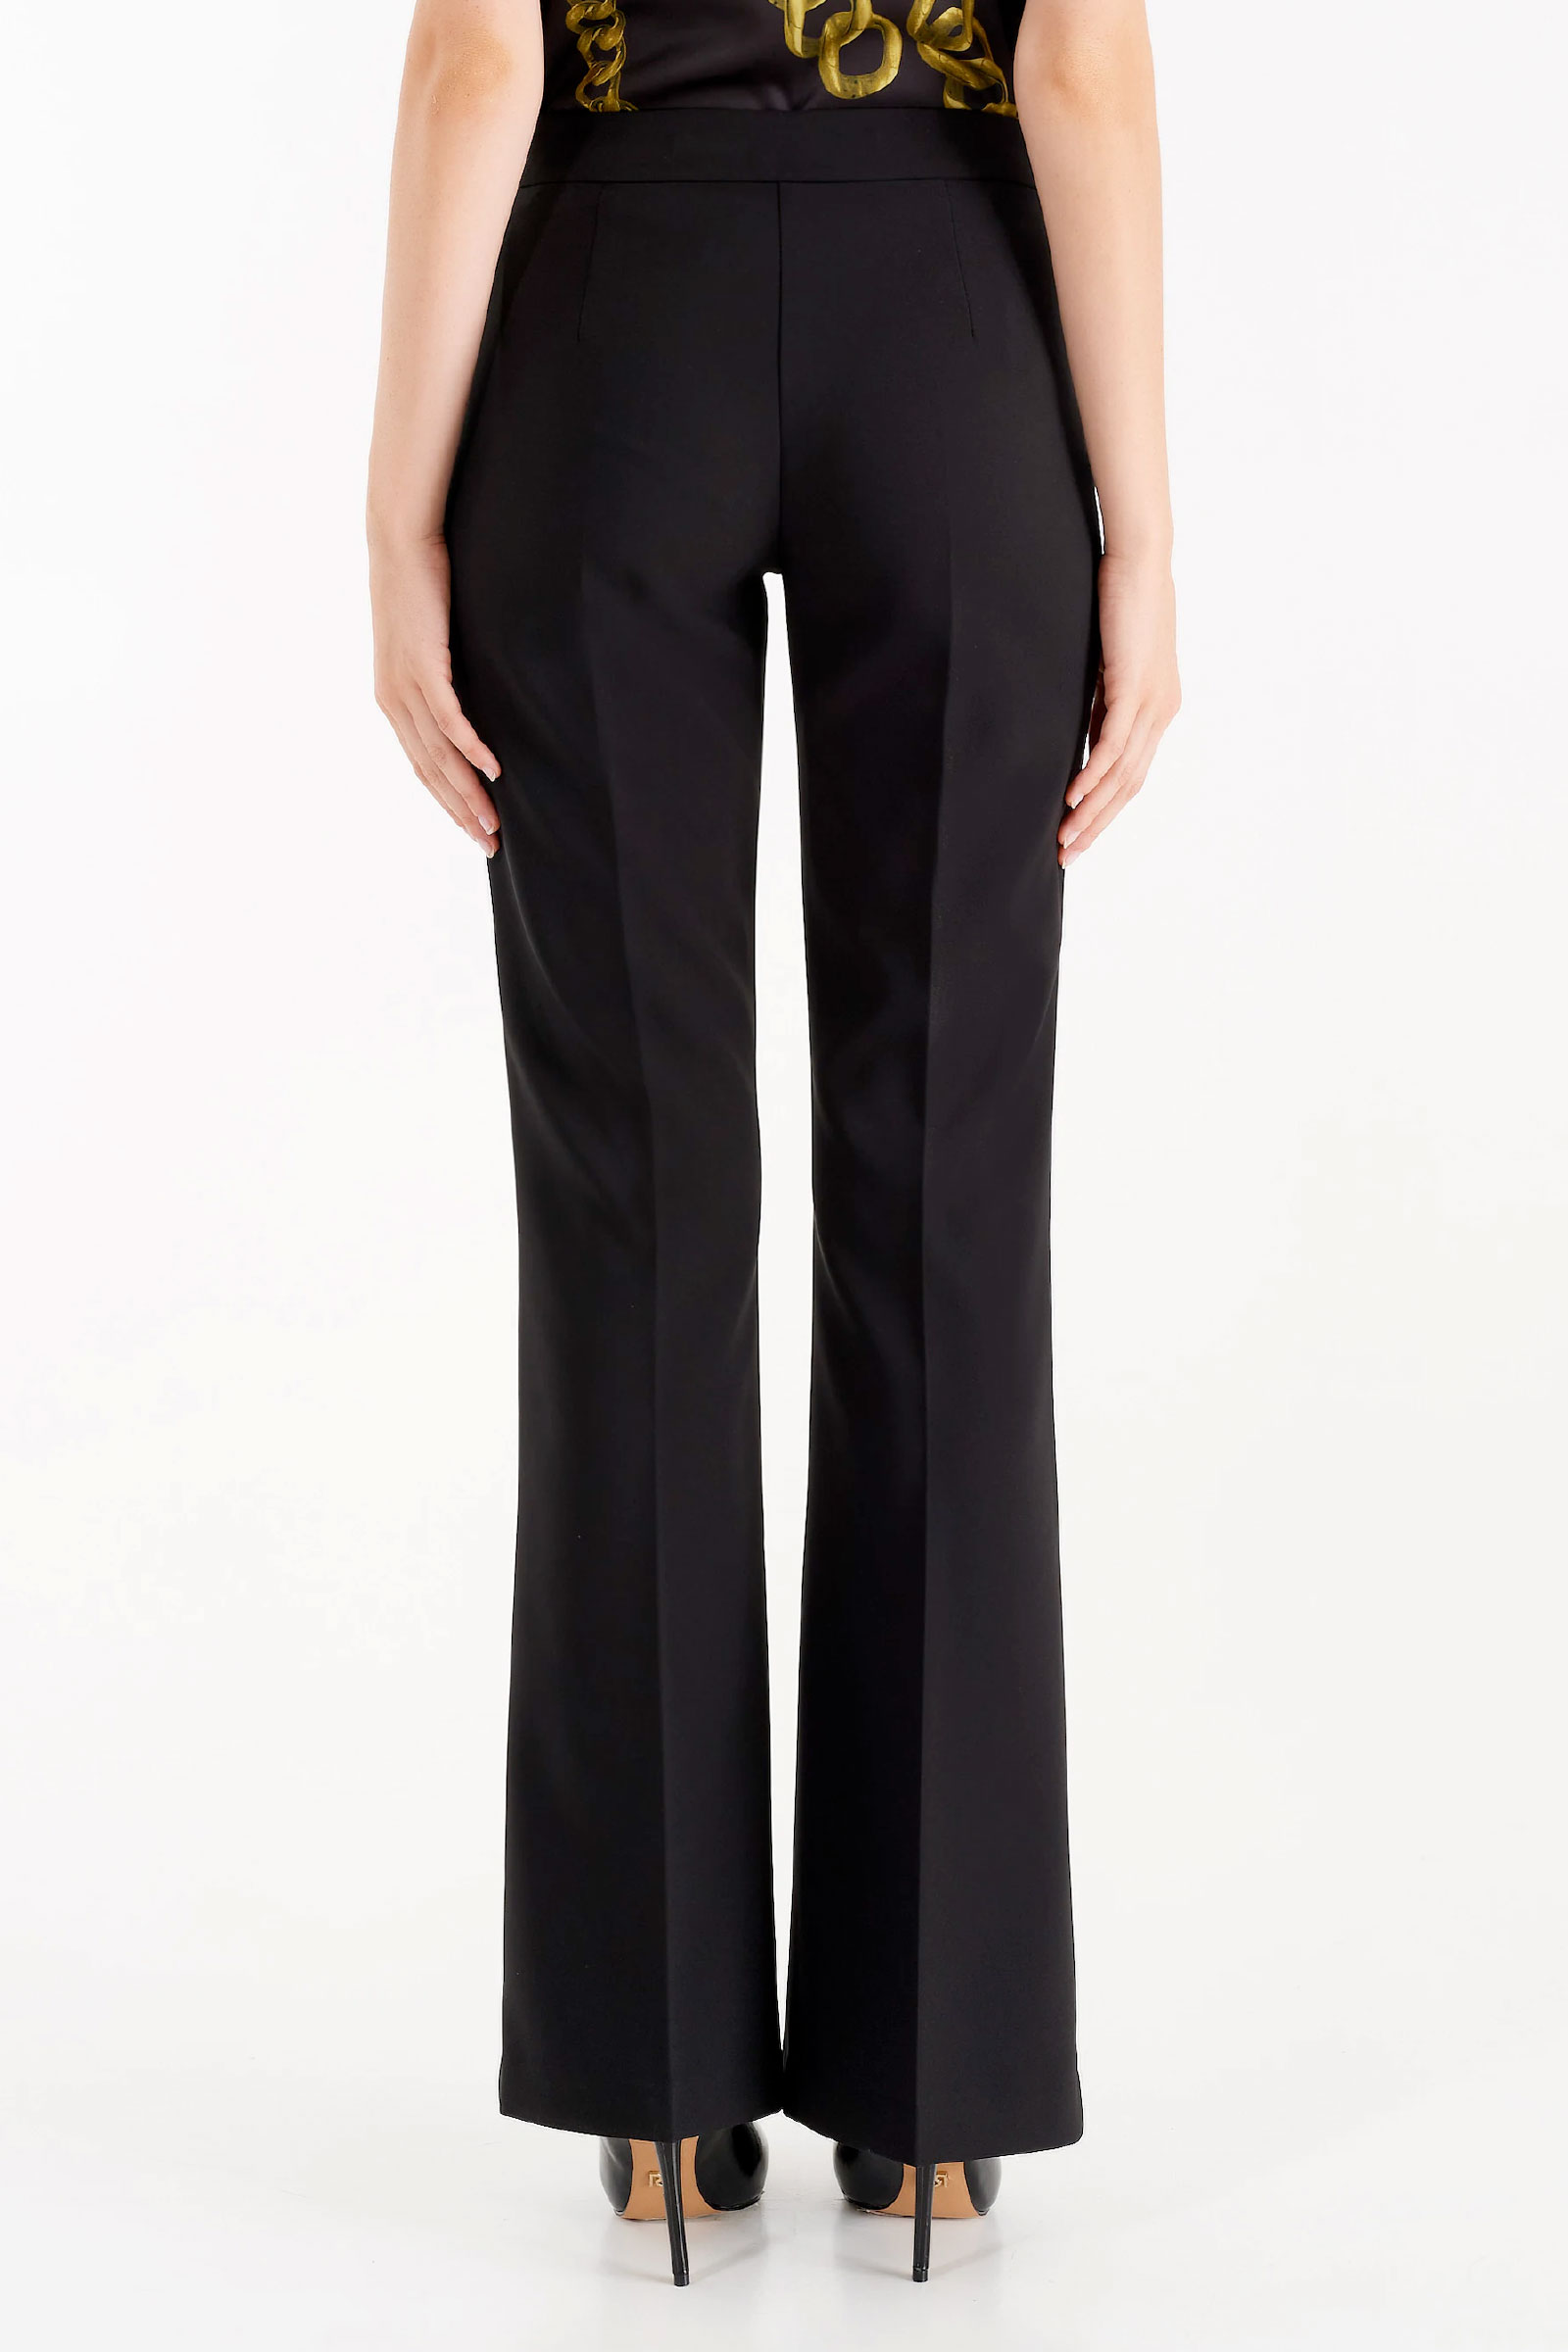 RINASCIMENTO | Trousers | CFC0105018003B001